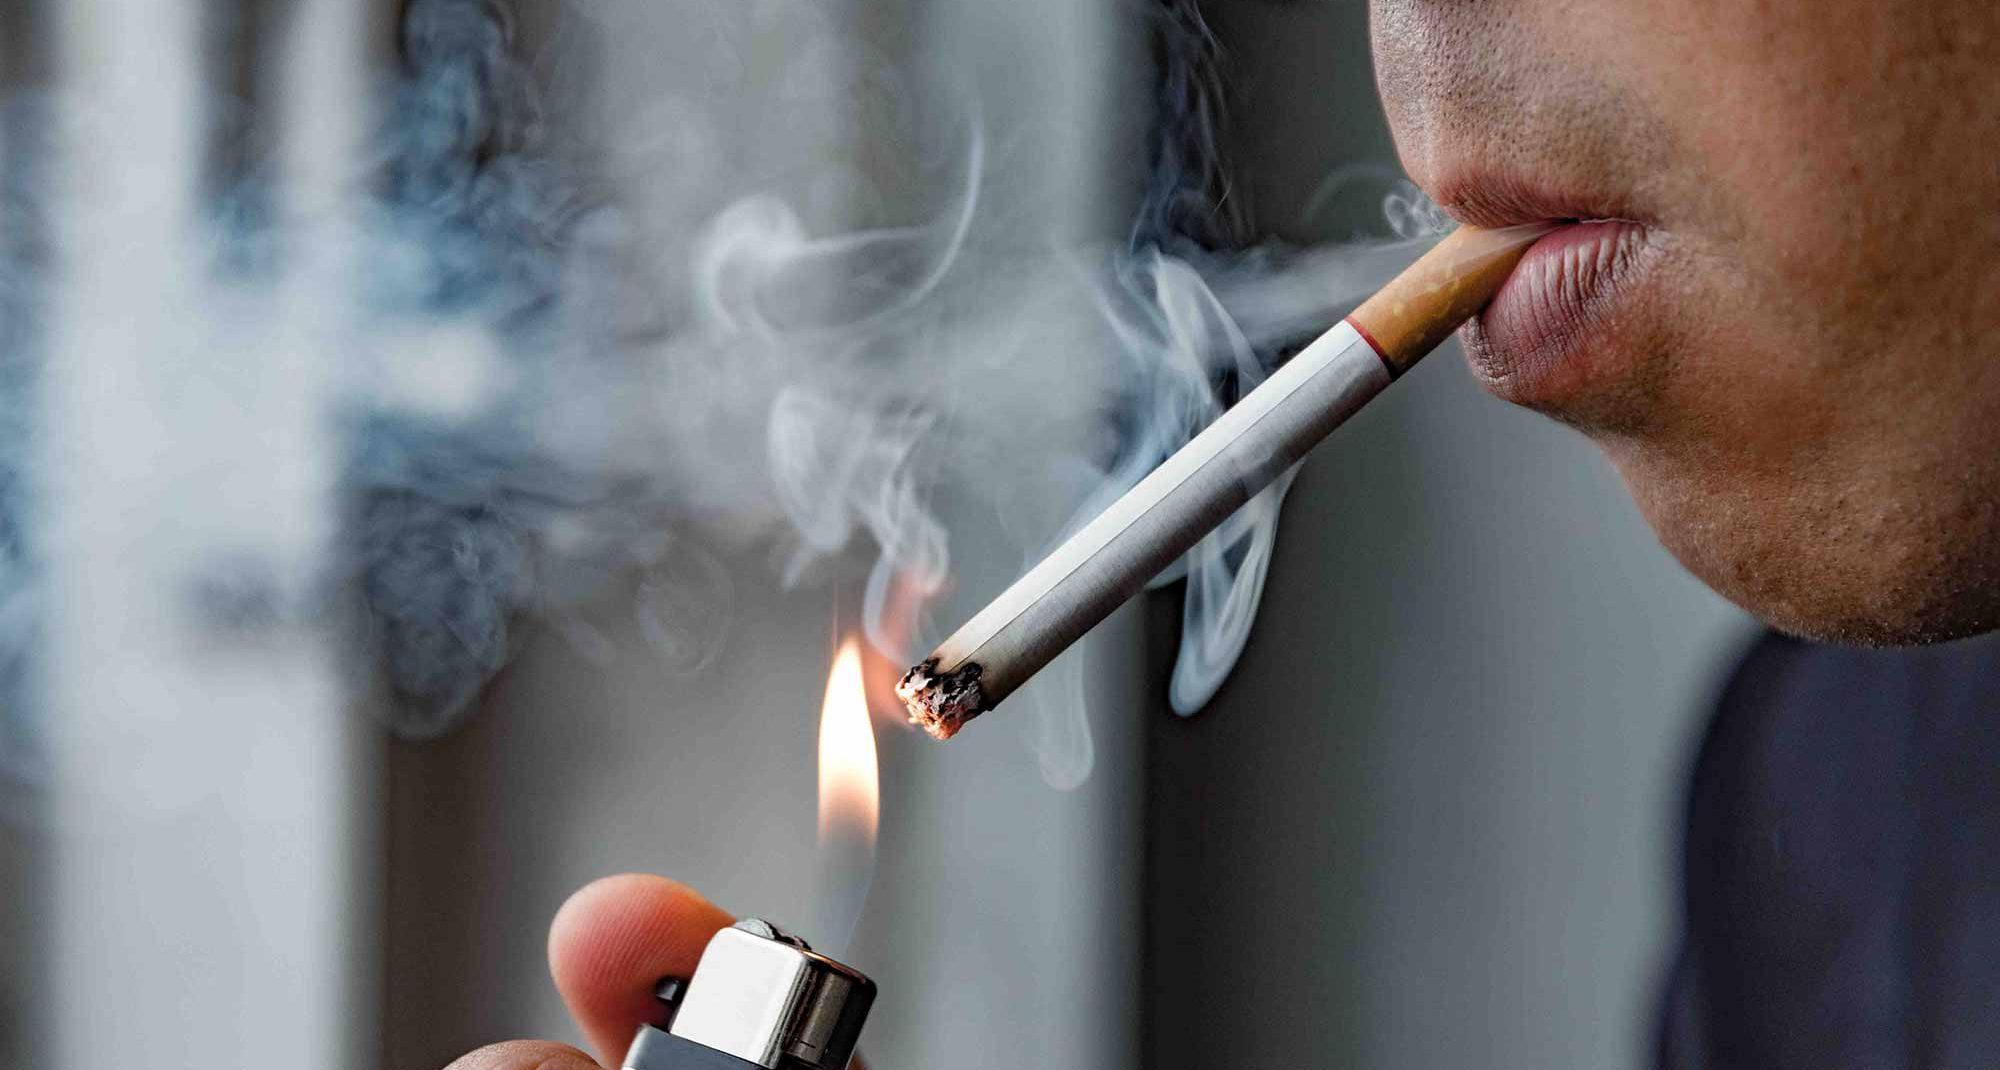 smoking and changing behaviour